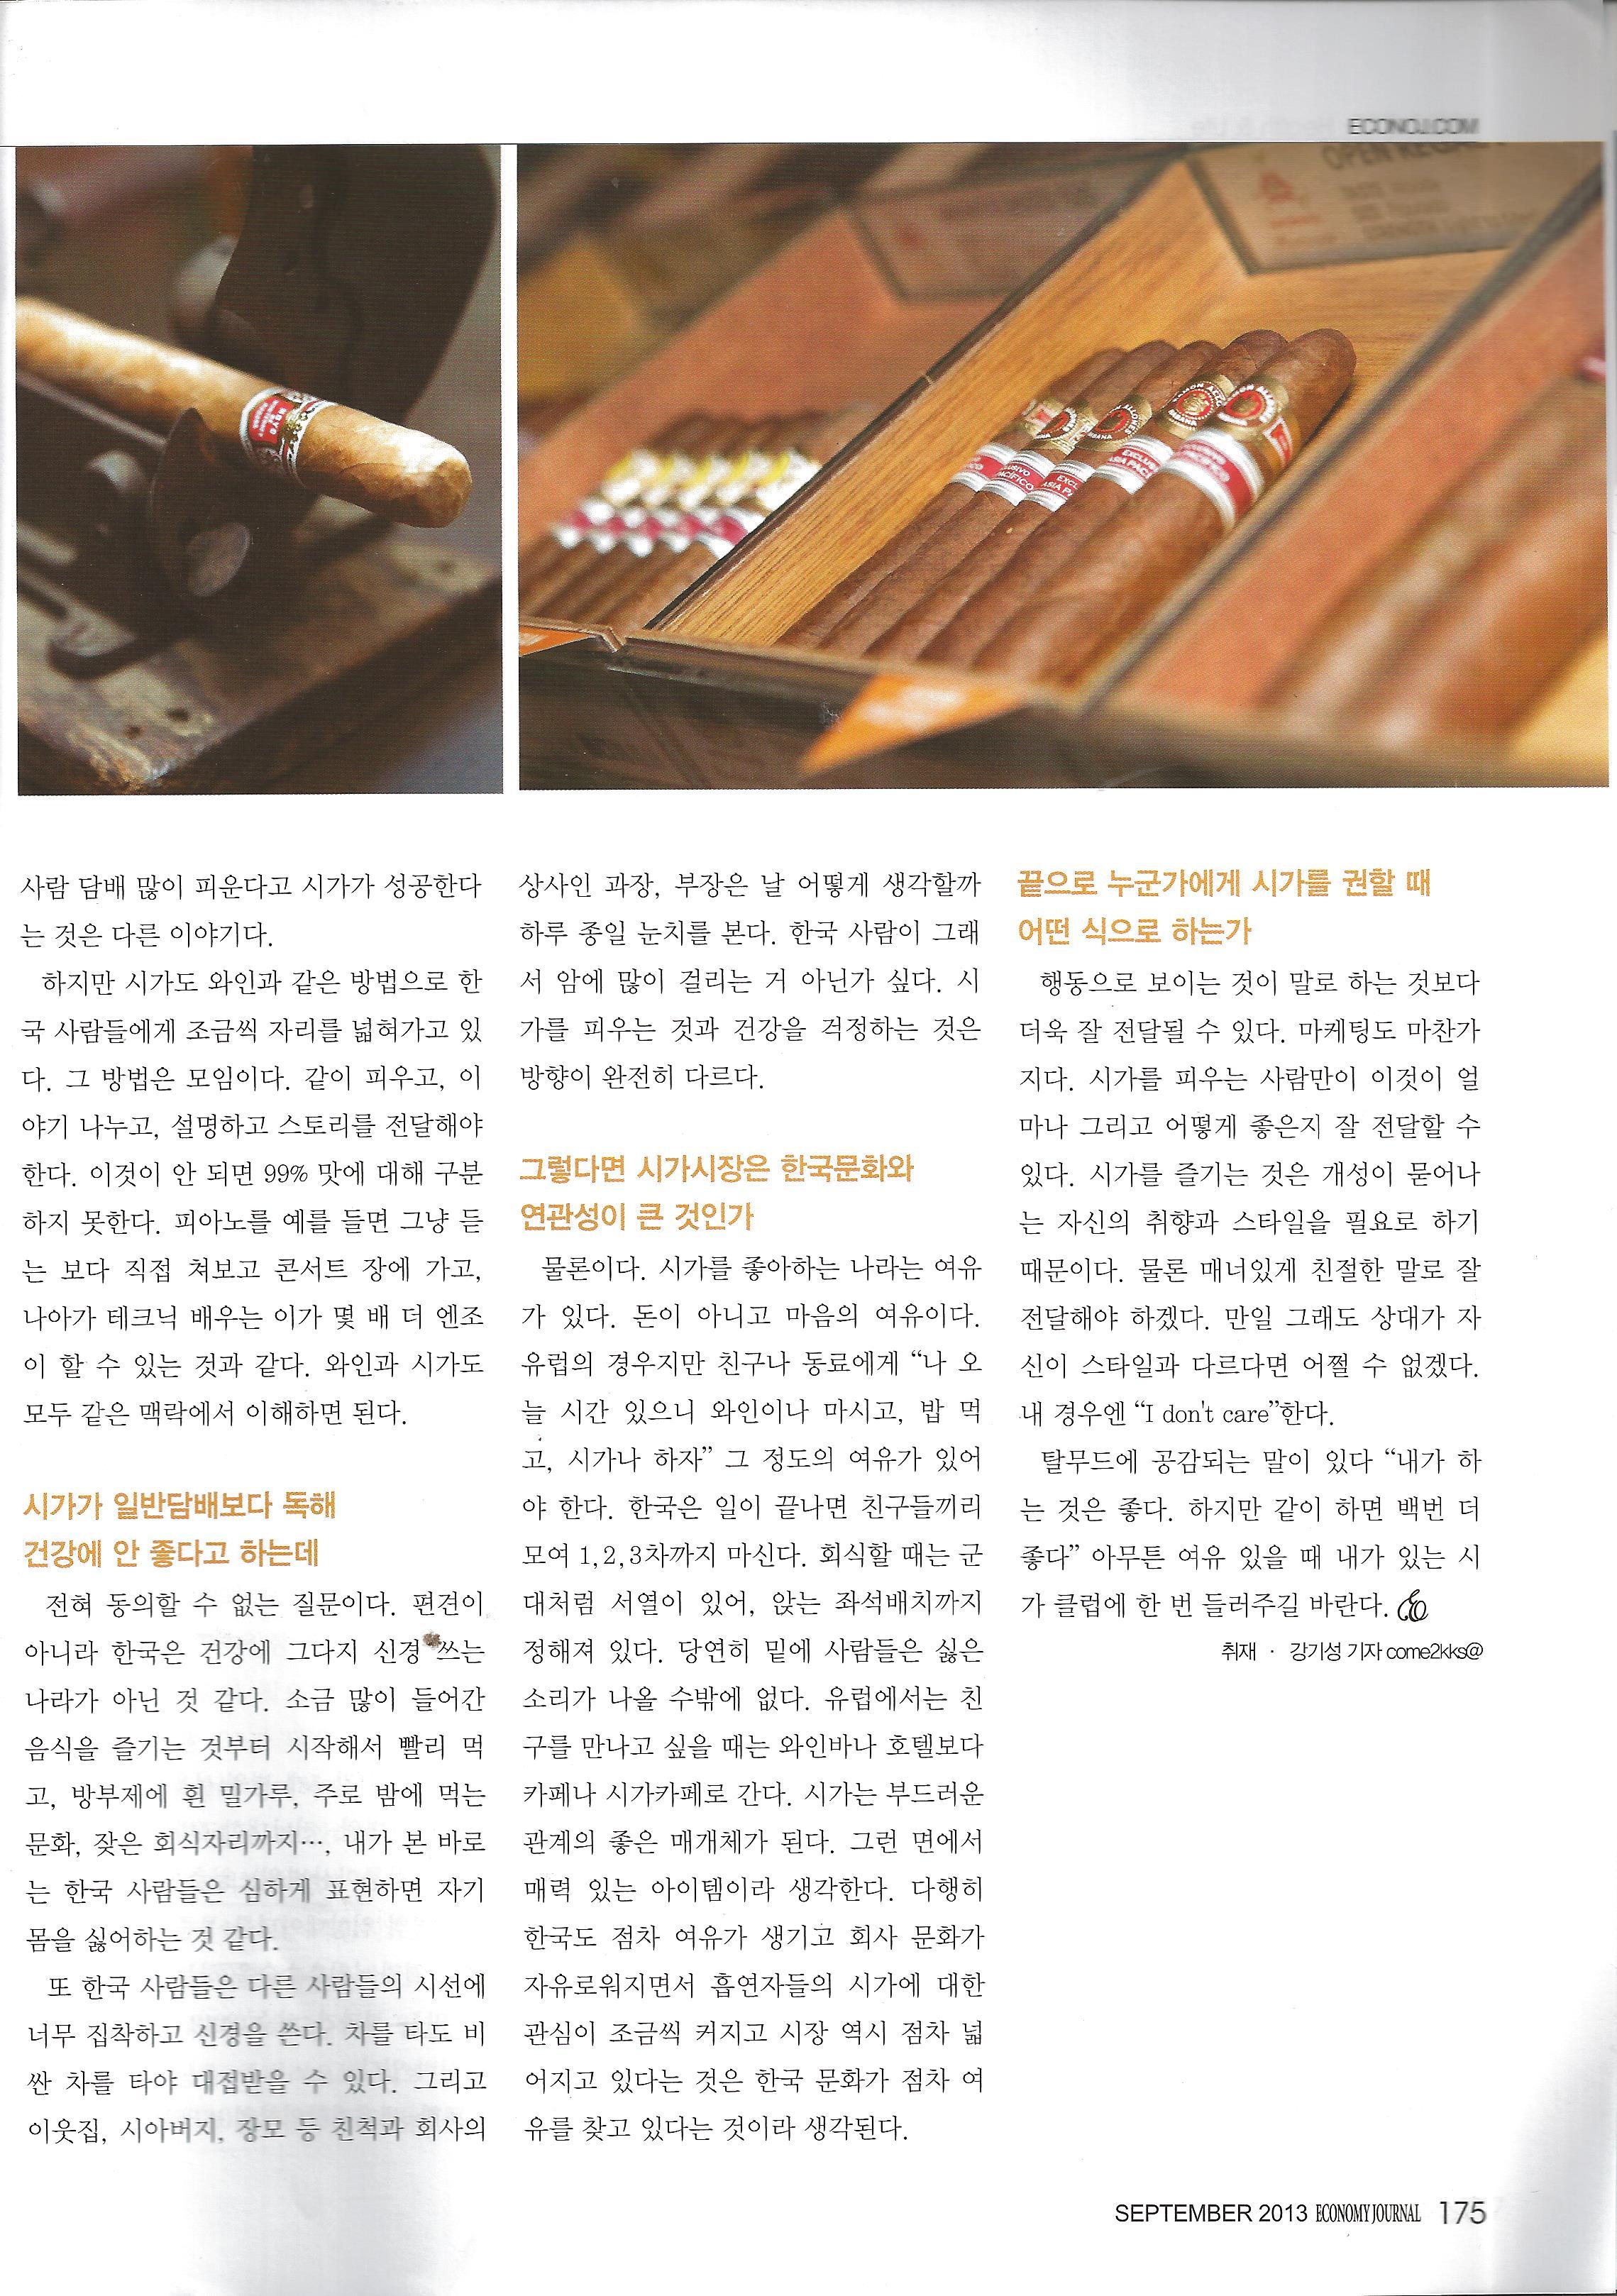 2013-9 Economy journal article 3.jpg